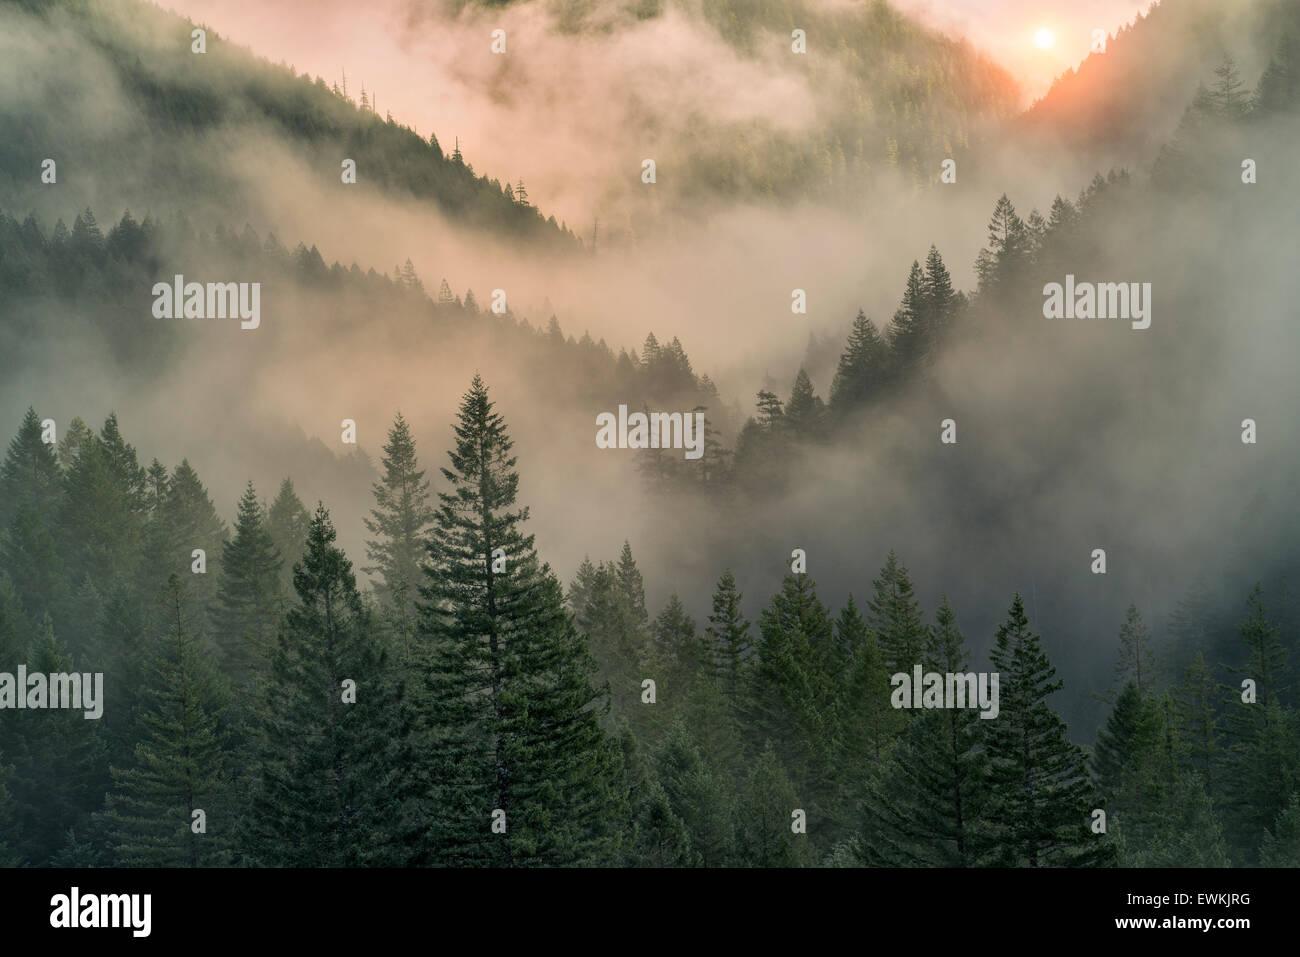 Sonnenaufgang über dem Nebel in den Bergen in der Nähe von Opal Creek, Oregon Stockbild